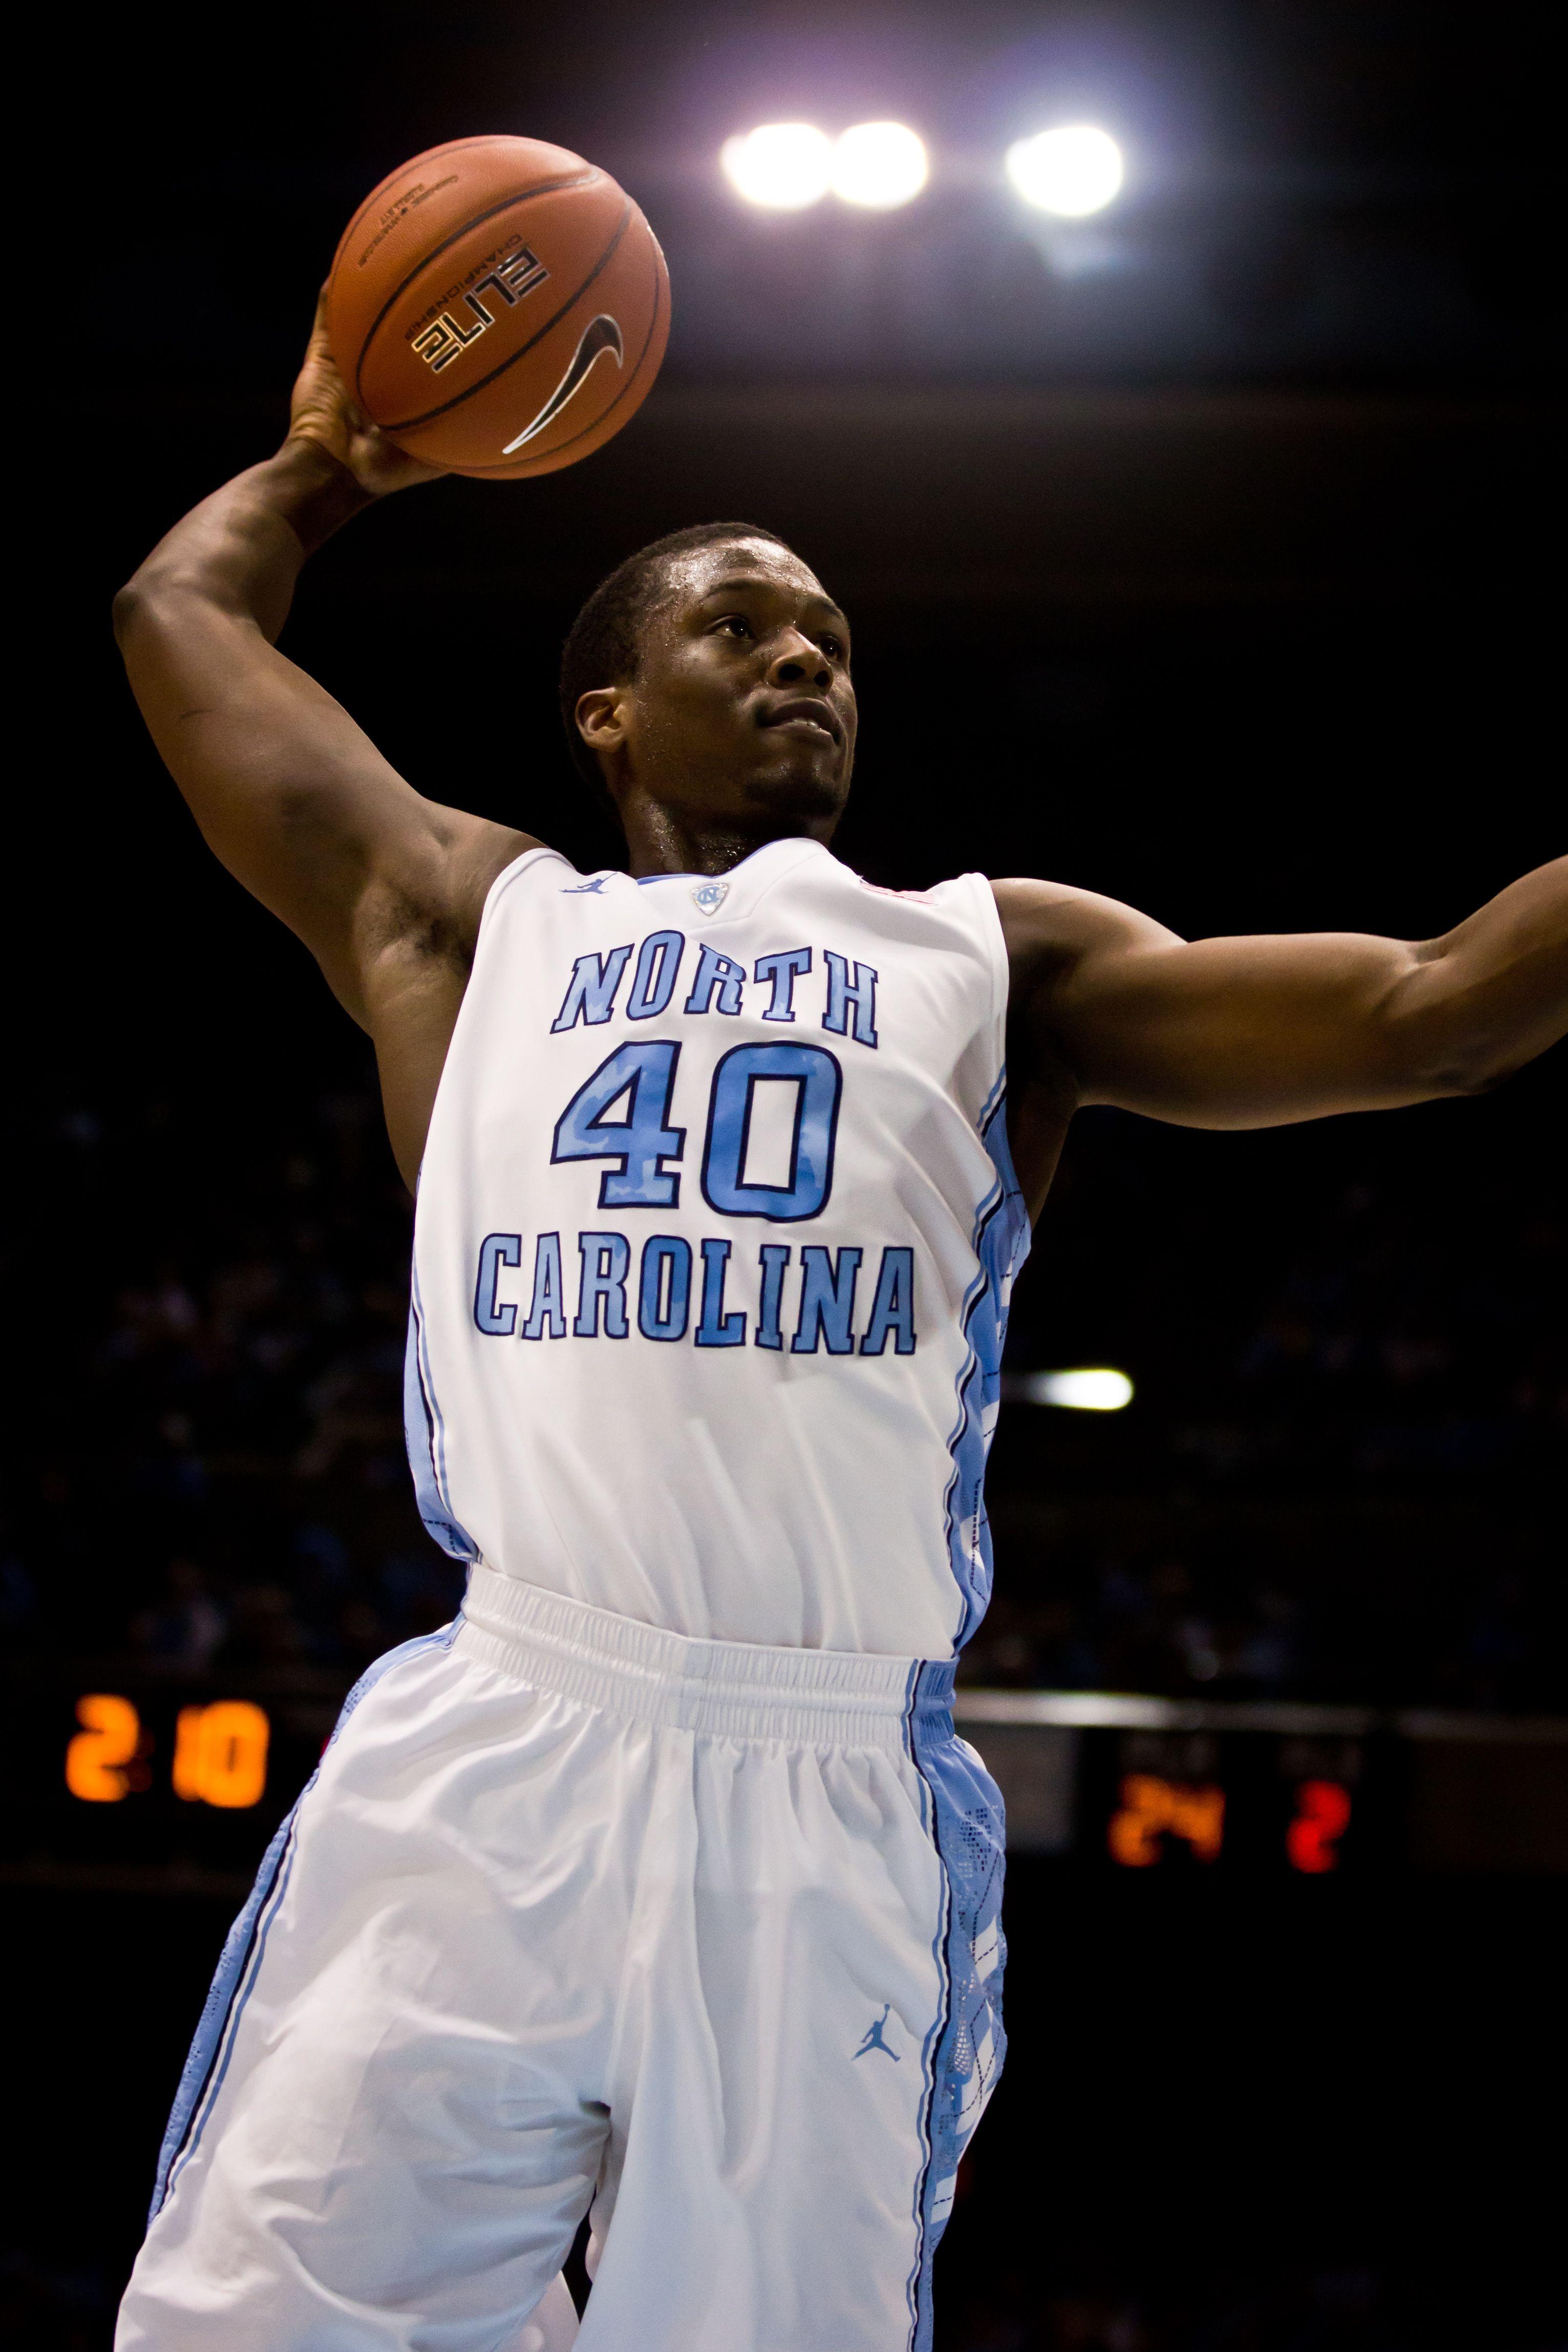 Basketball Tony Bradley Signed Unc North Carolina Tar Heels Signed 8x10 Photo Autographed 2 In Pain